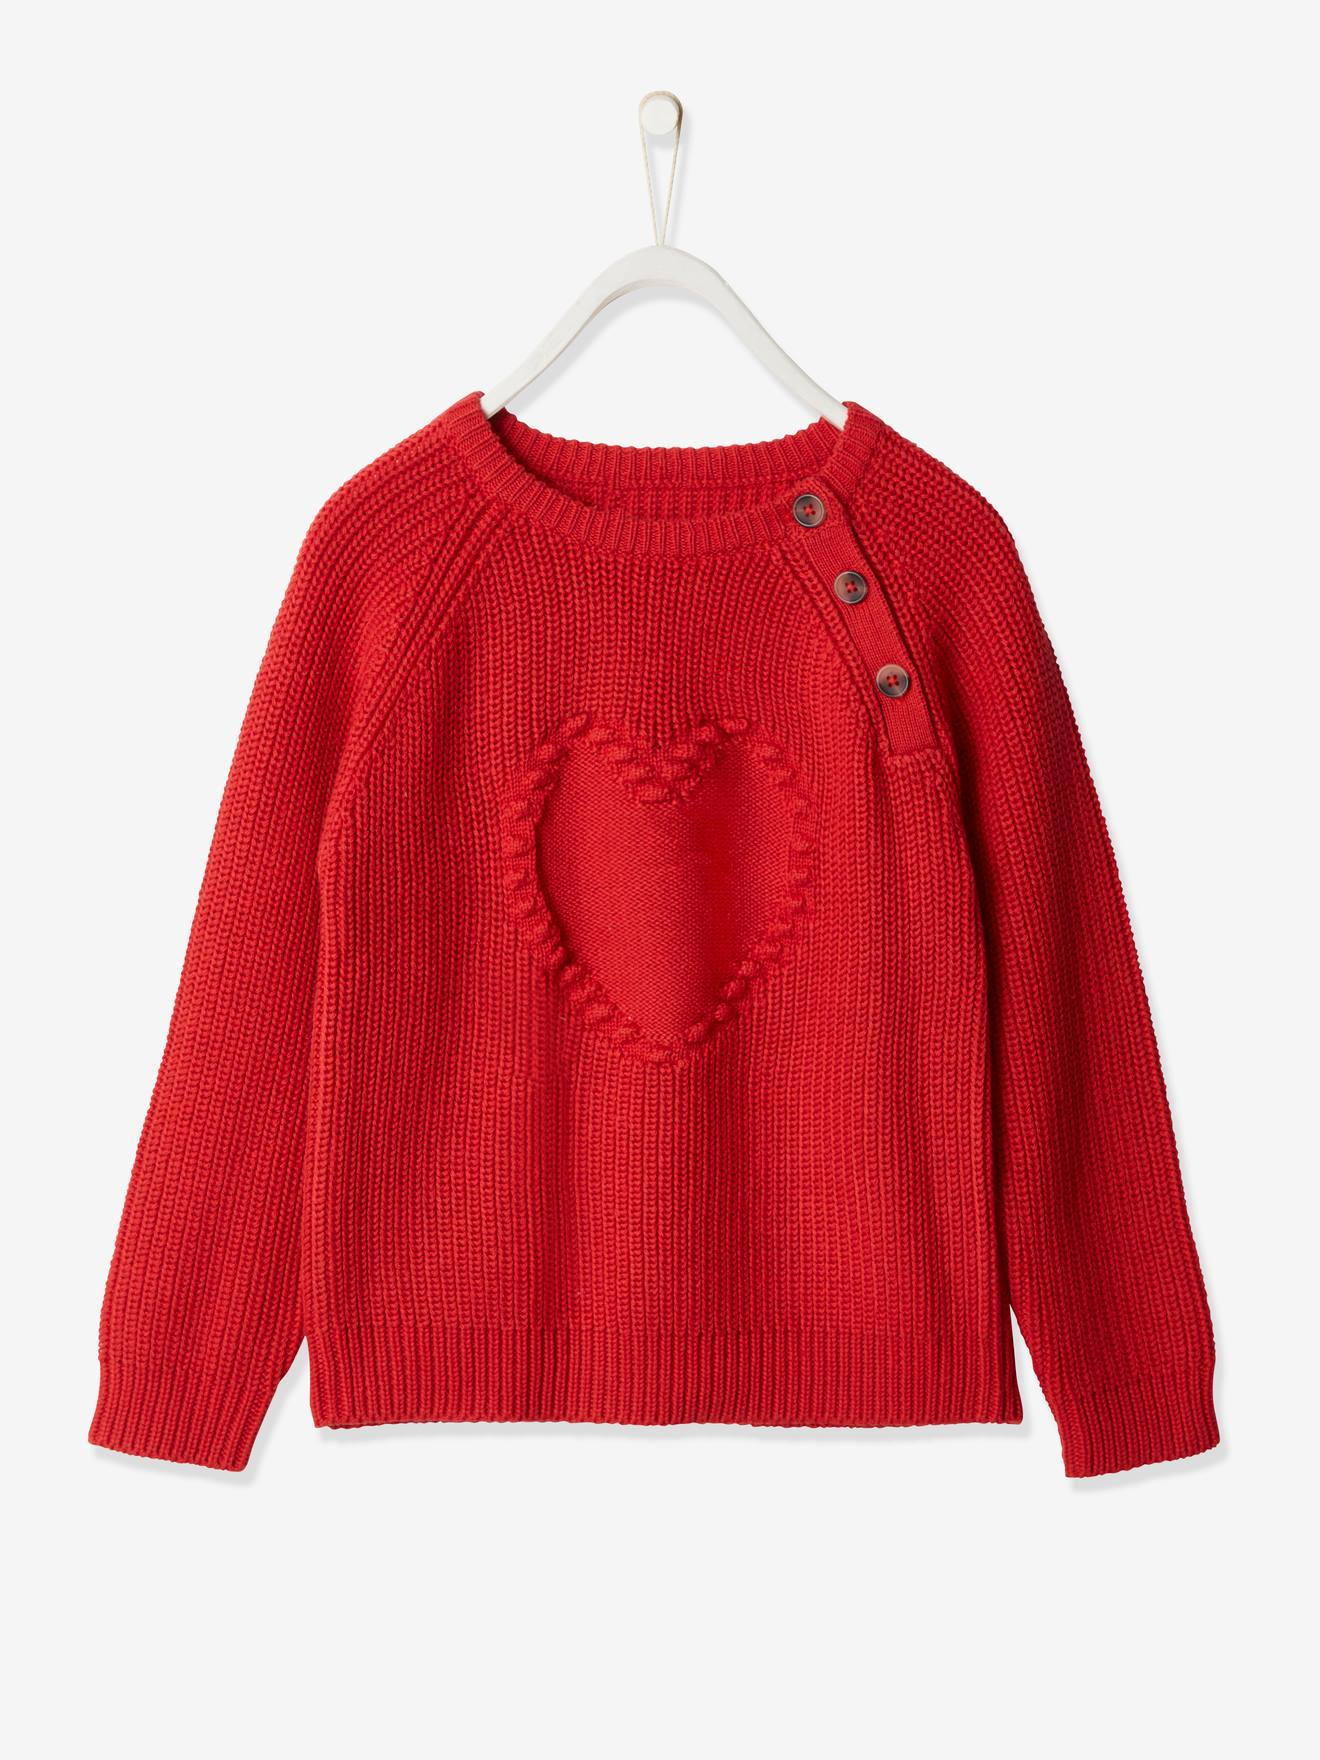 Pull fille motif jacquard en maille fantaisie Oeko-Tex® rouge